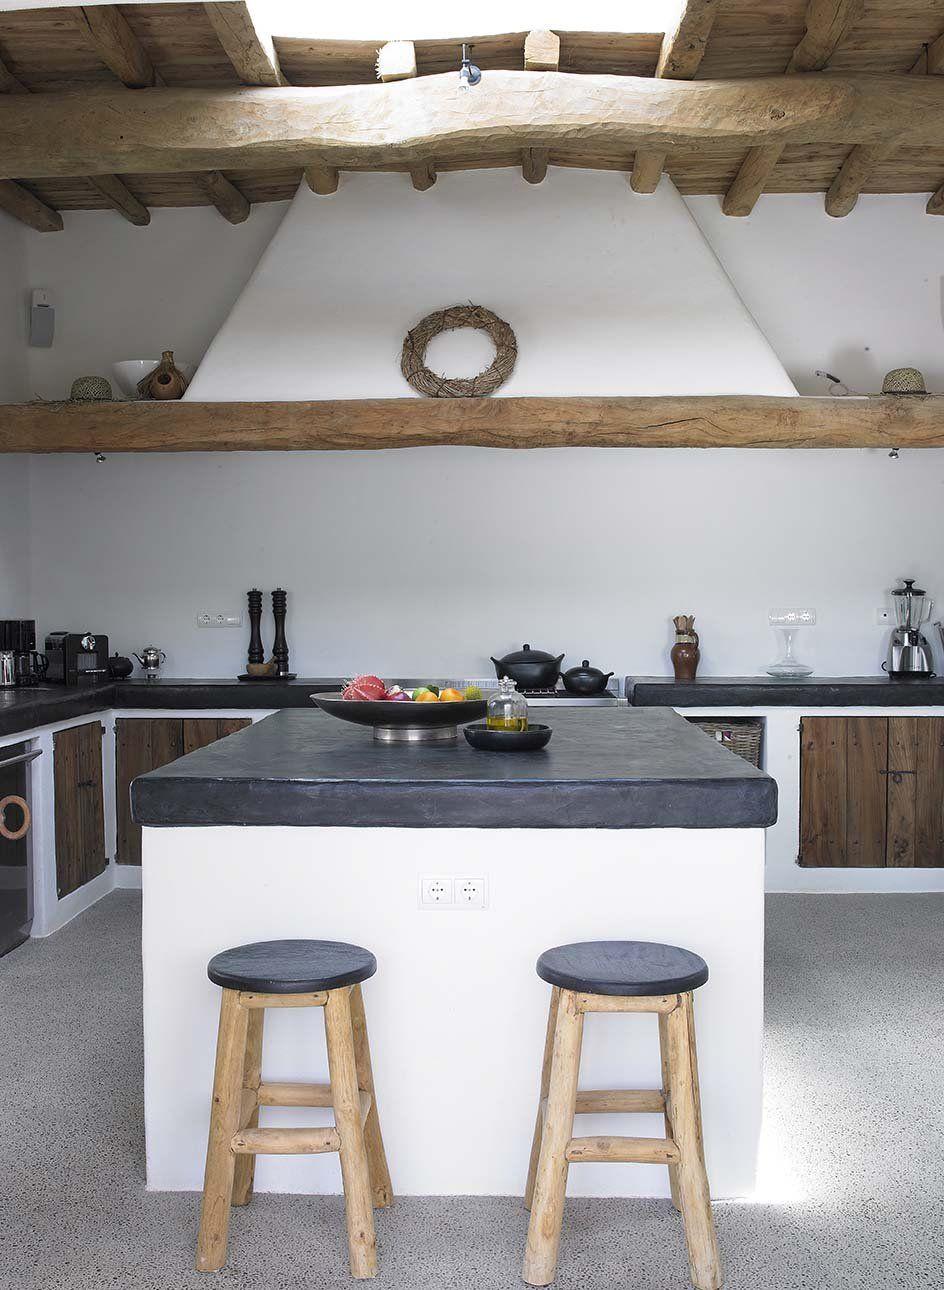 Bellissima cucina in muratura rustica con isola